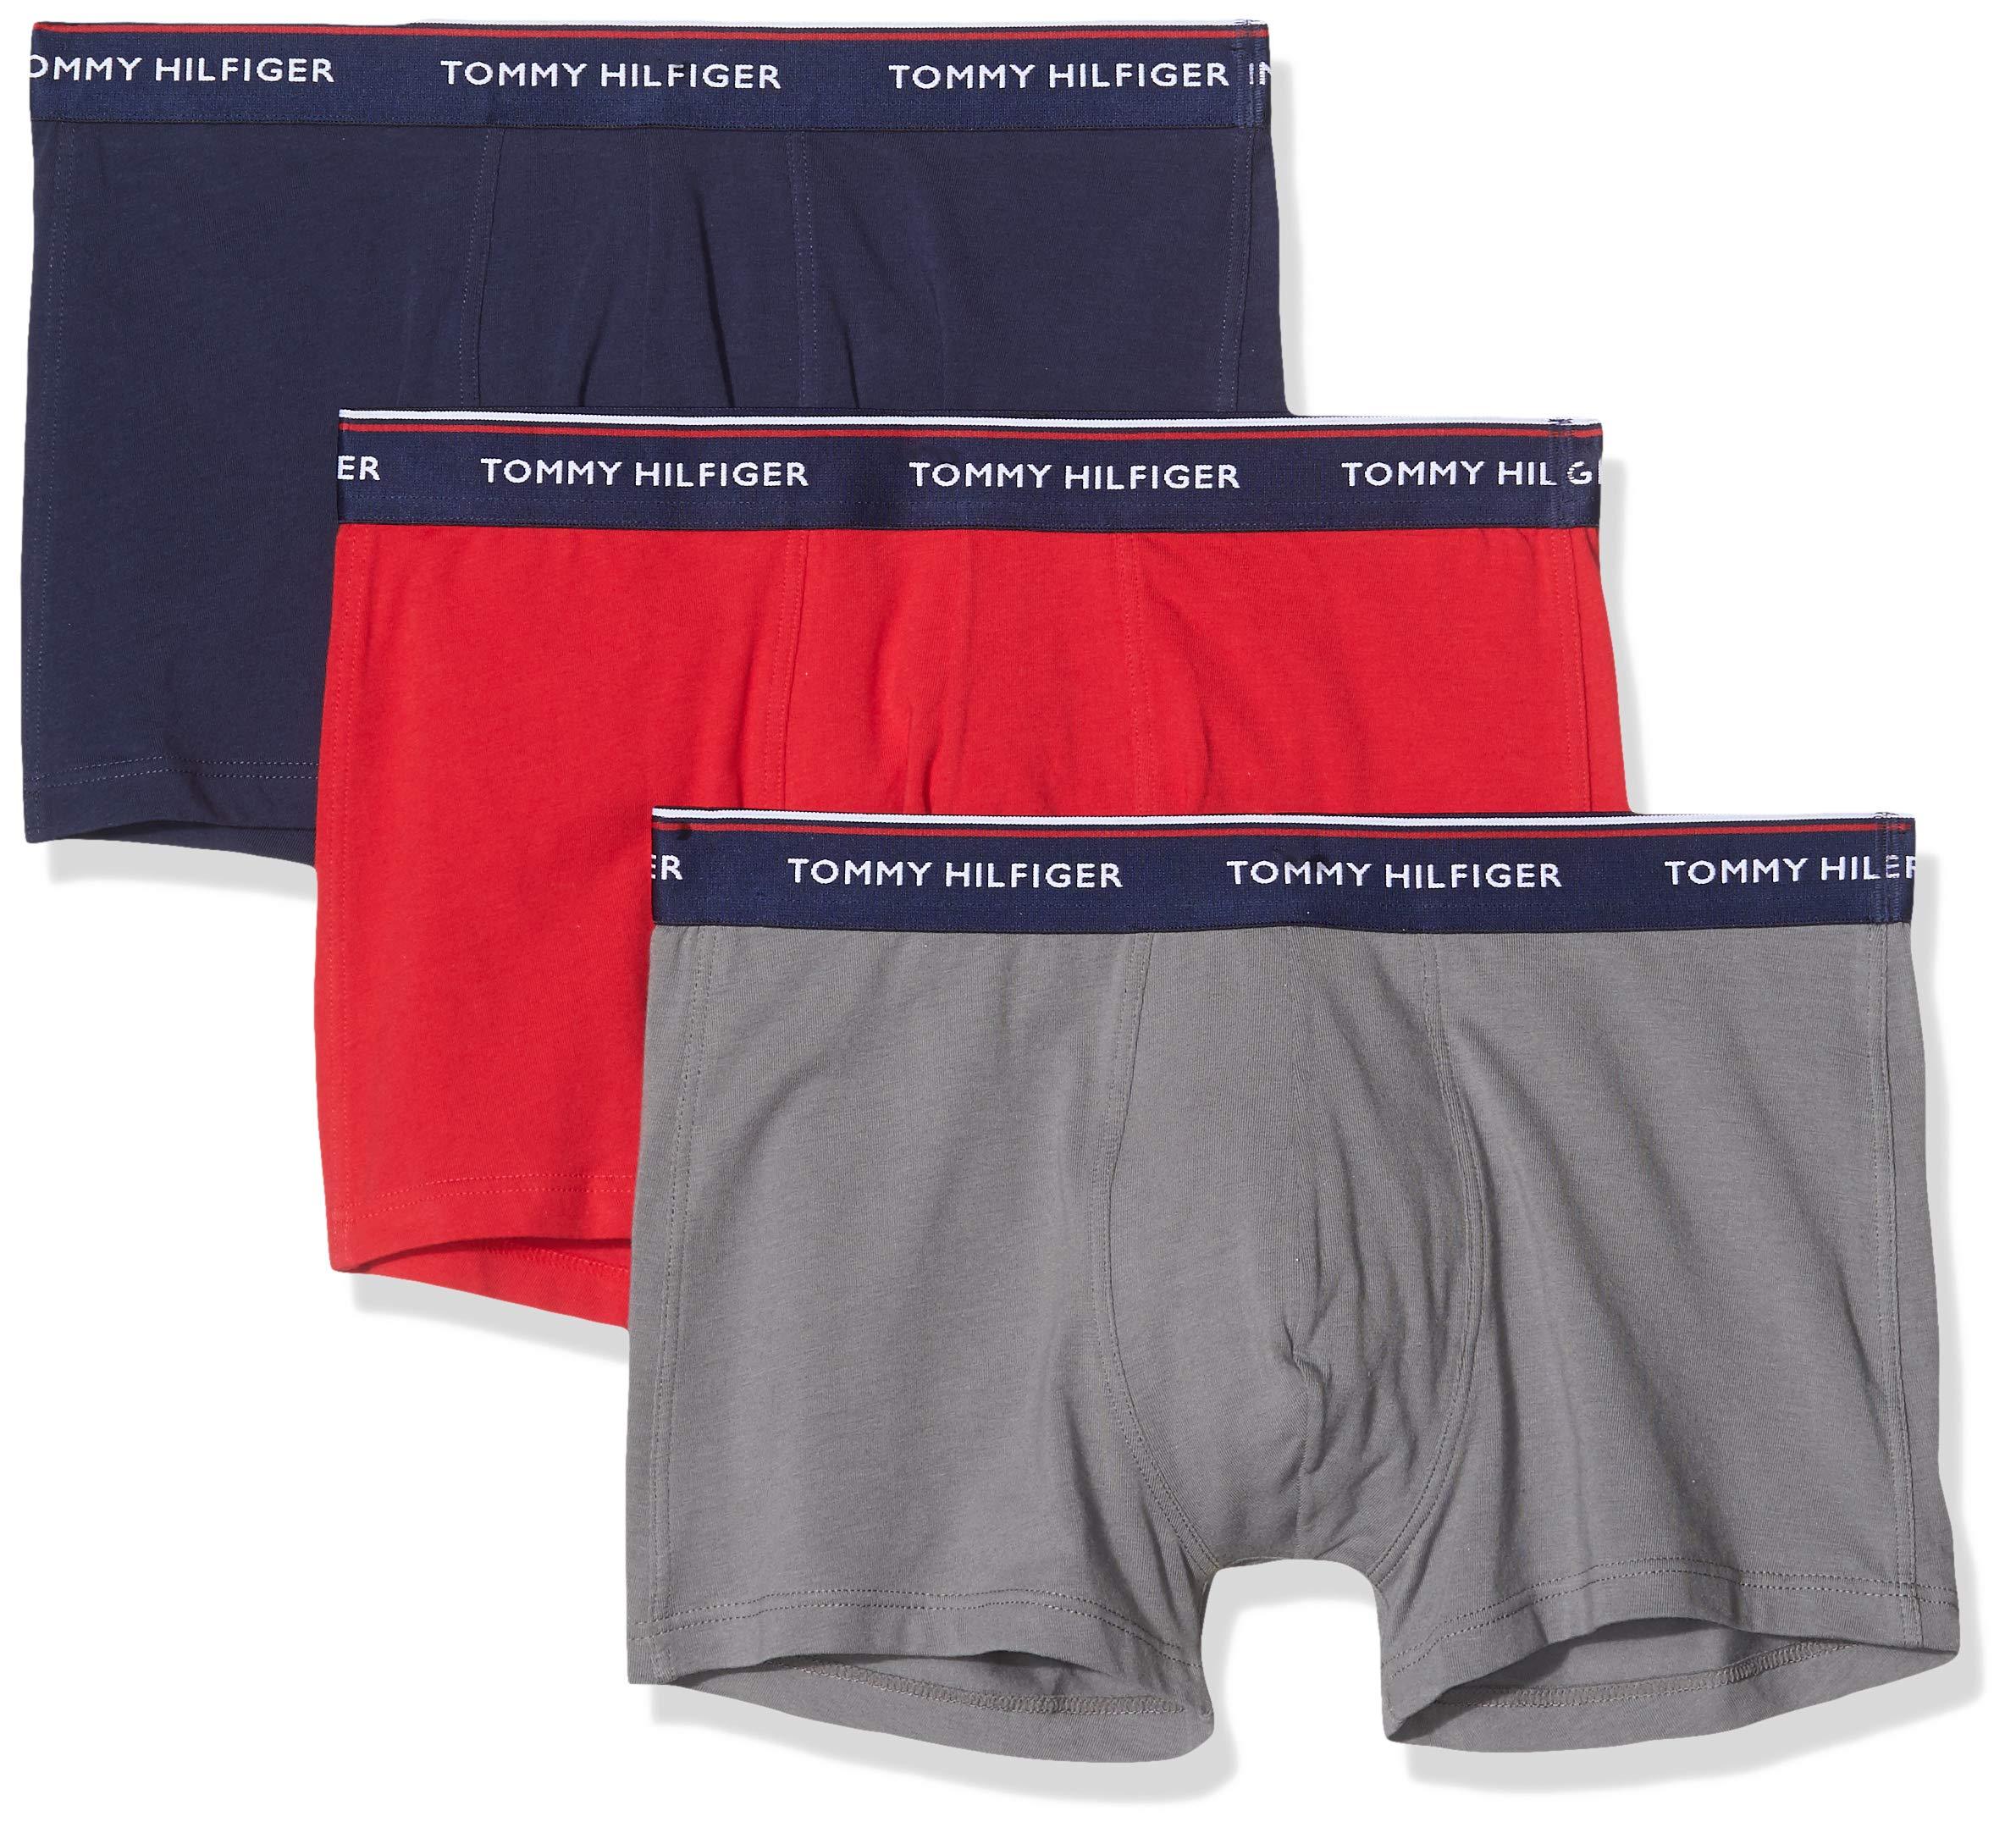 Men's Boxer Shorts (Pack of 3)